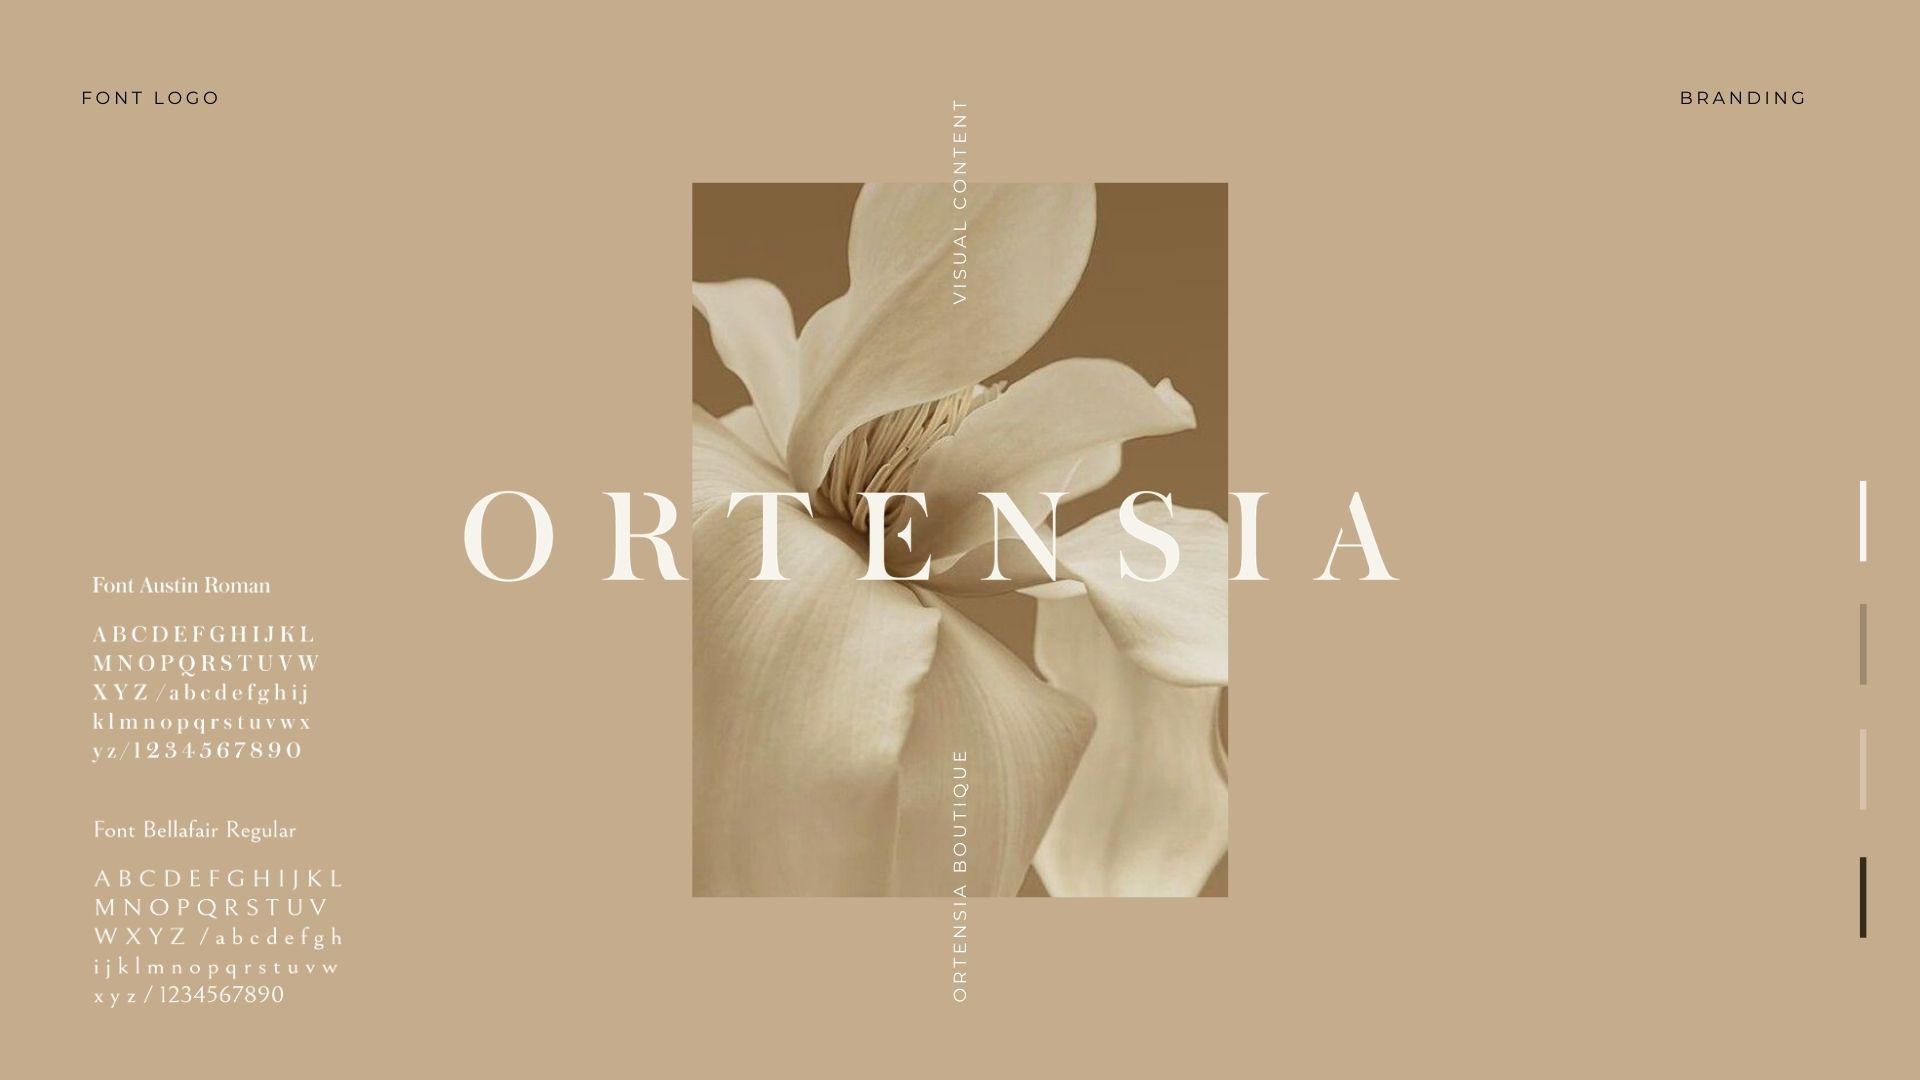 ORTENSIA_FINAL_PRESENTATION.jpg